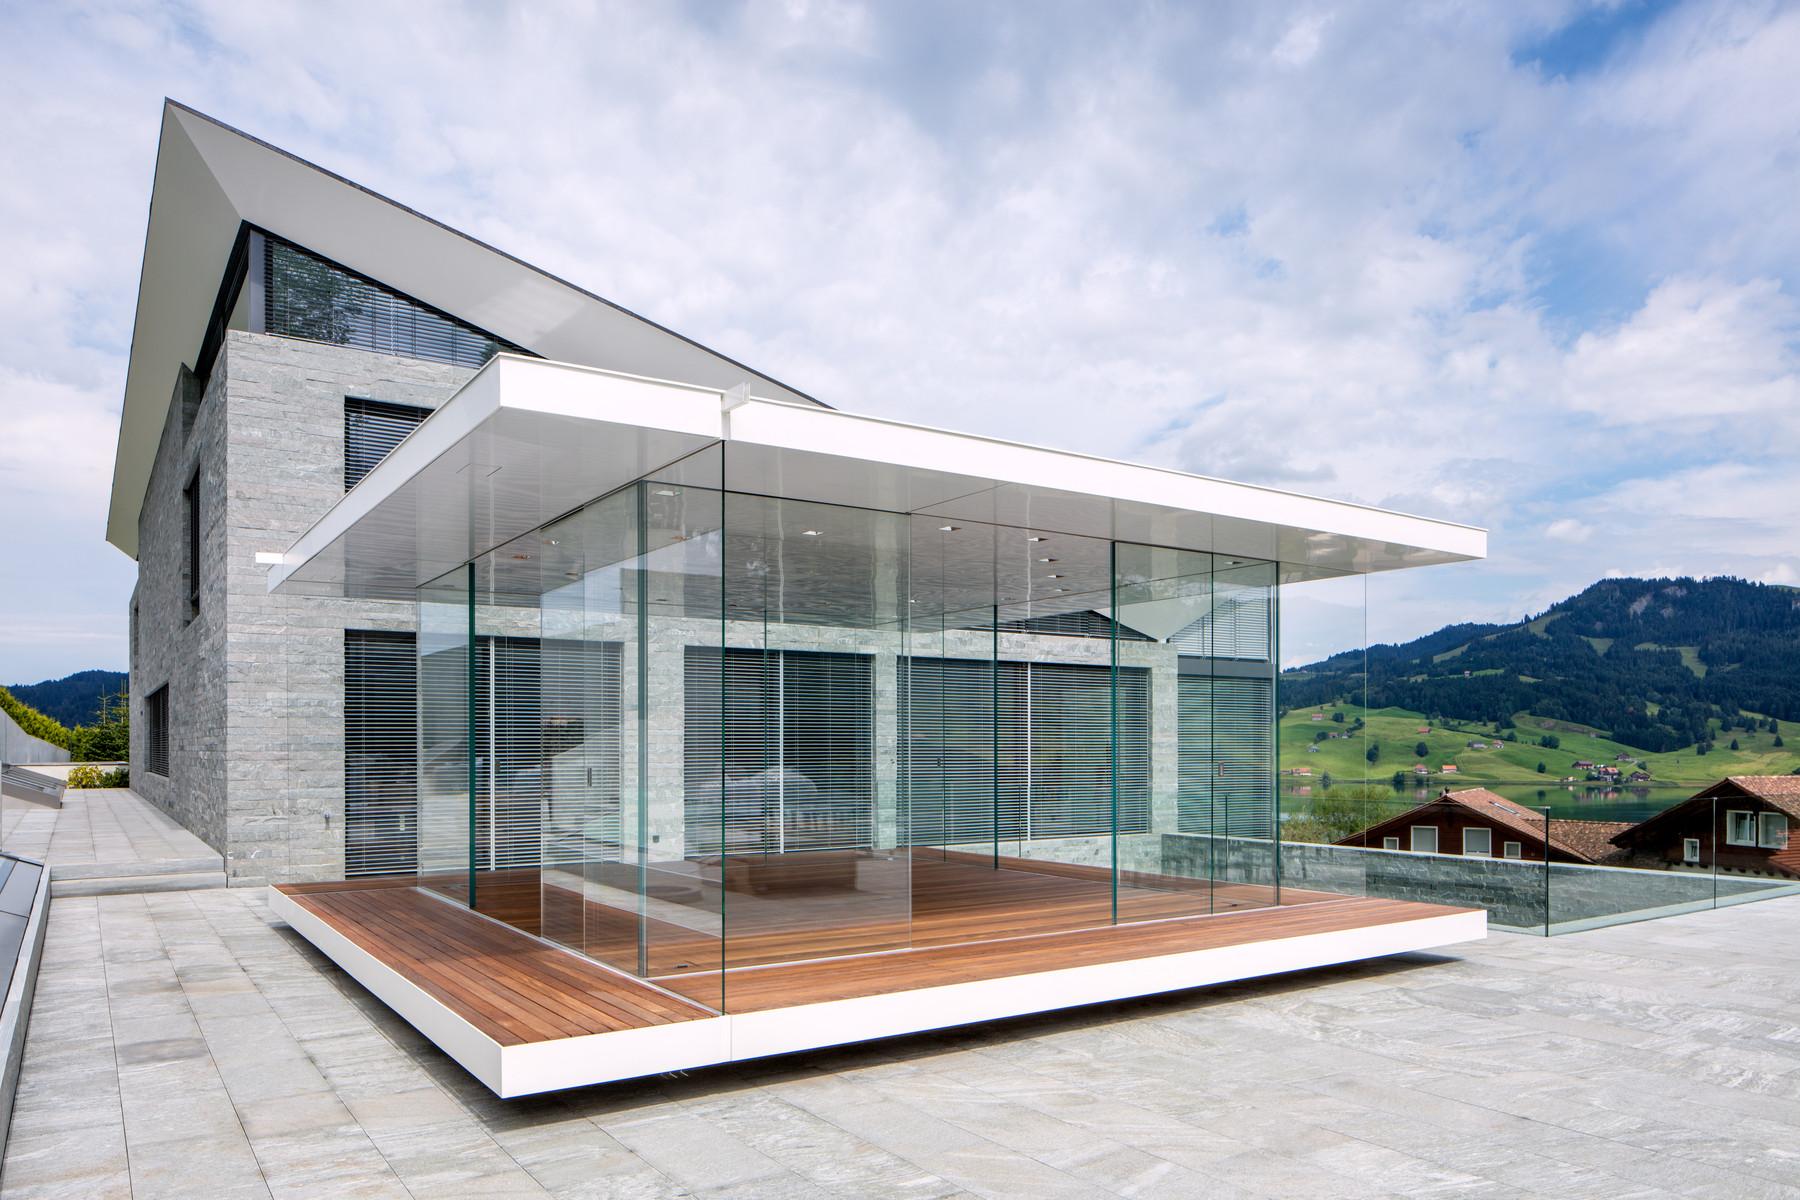 glaspavillon mit 360 rundsicht news glasvetia. Black Bedroom Furniture Sets. Home Design Ideas